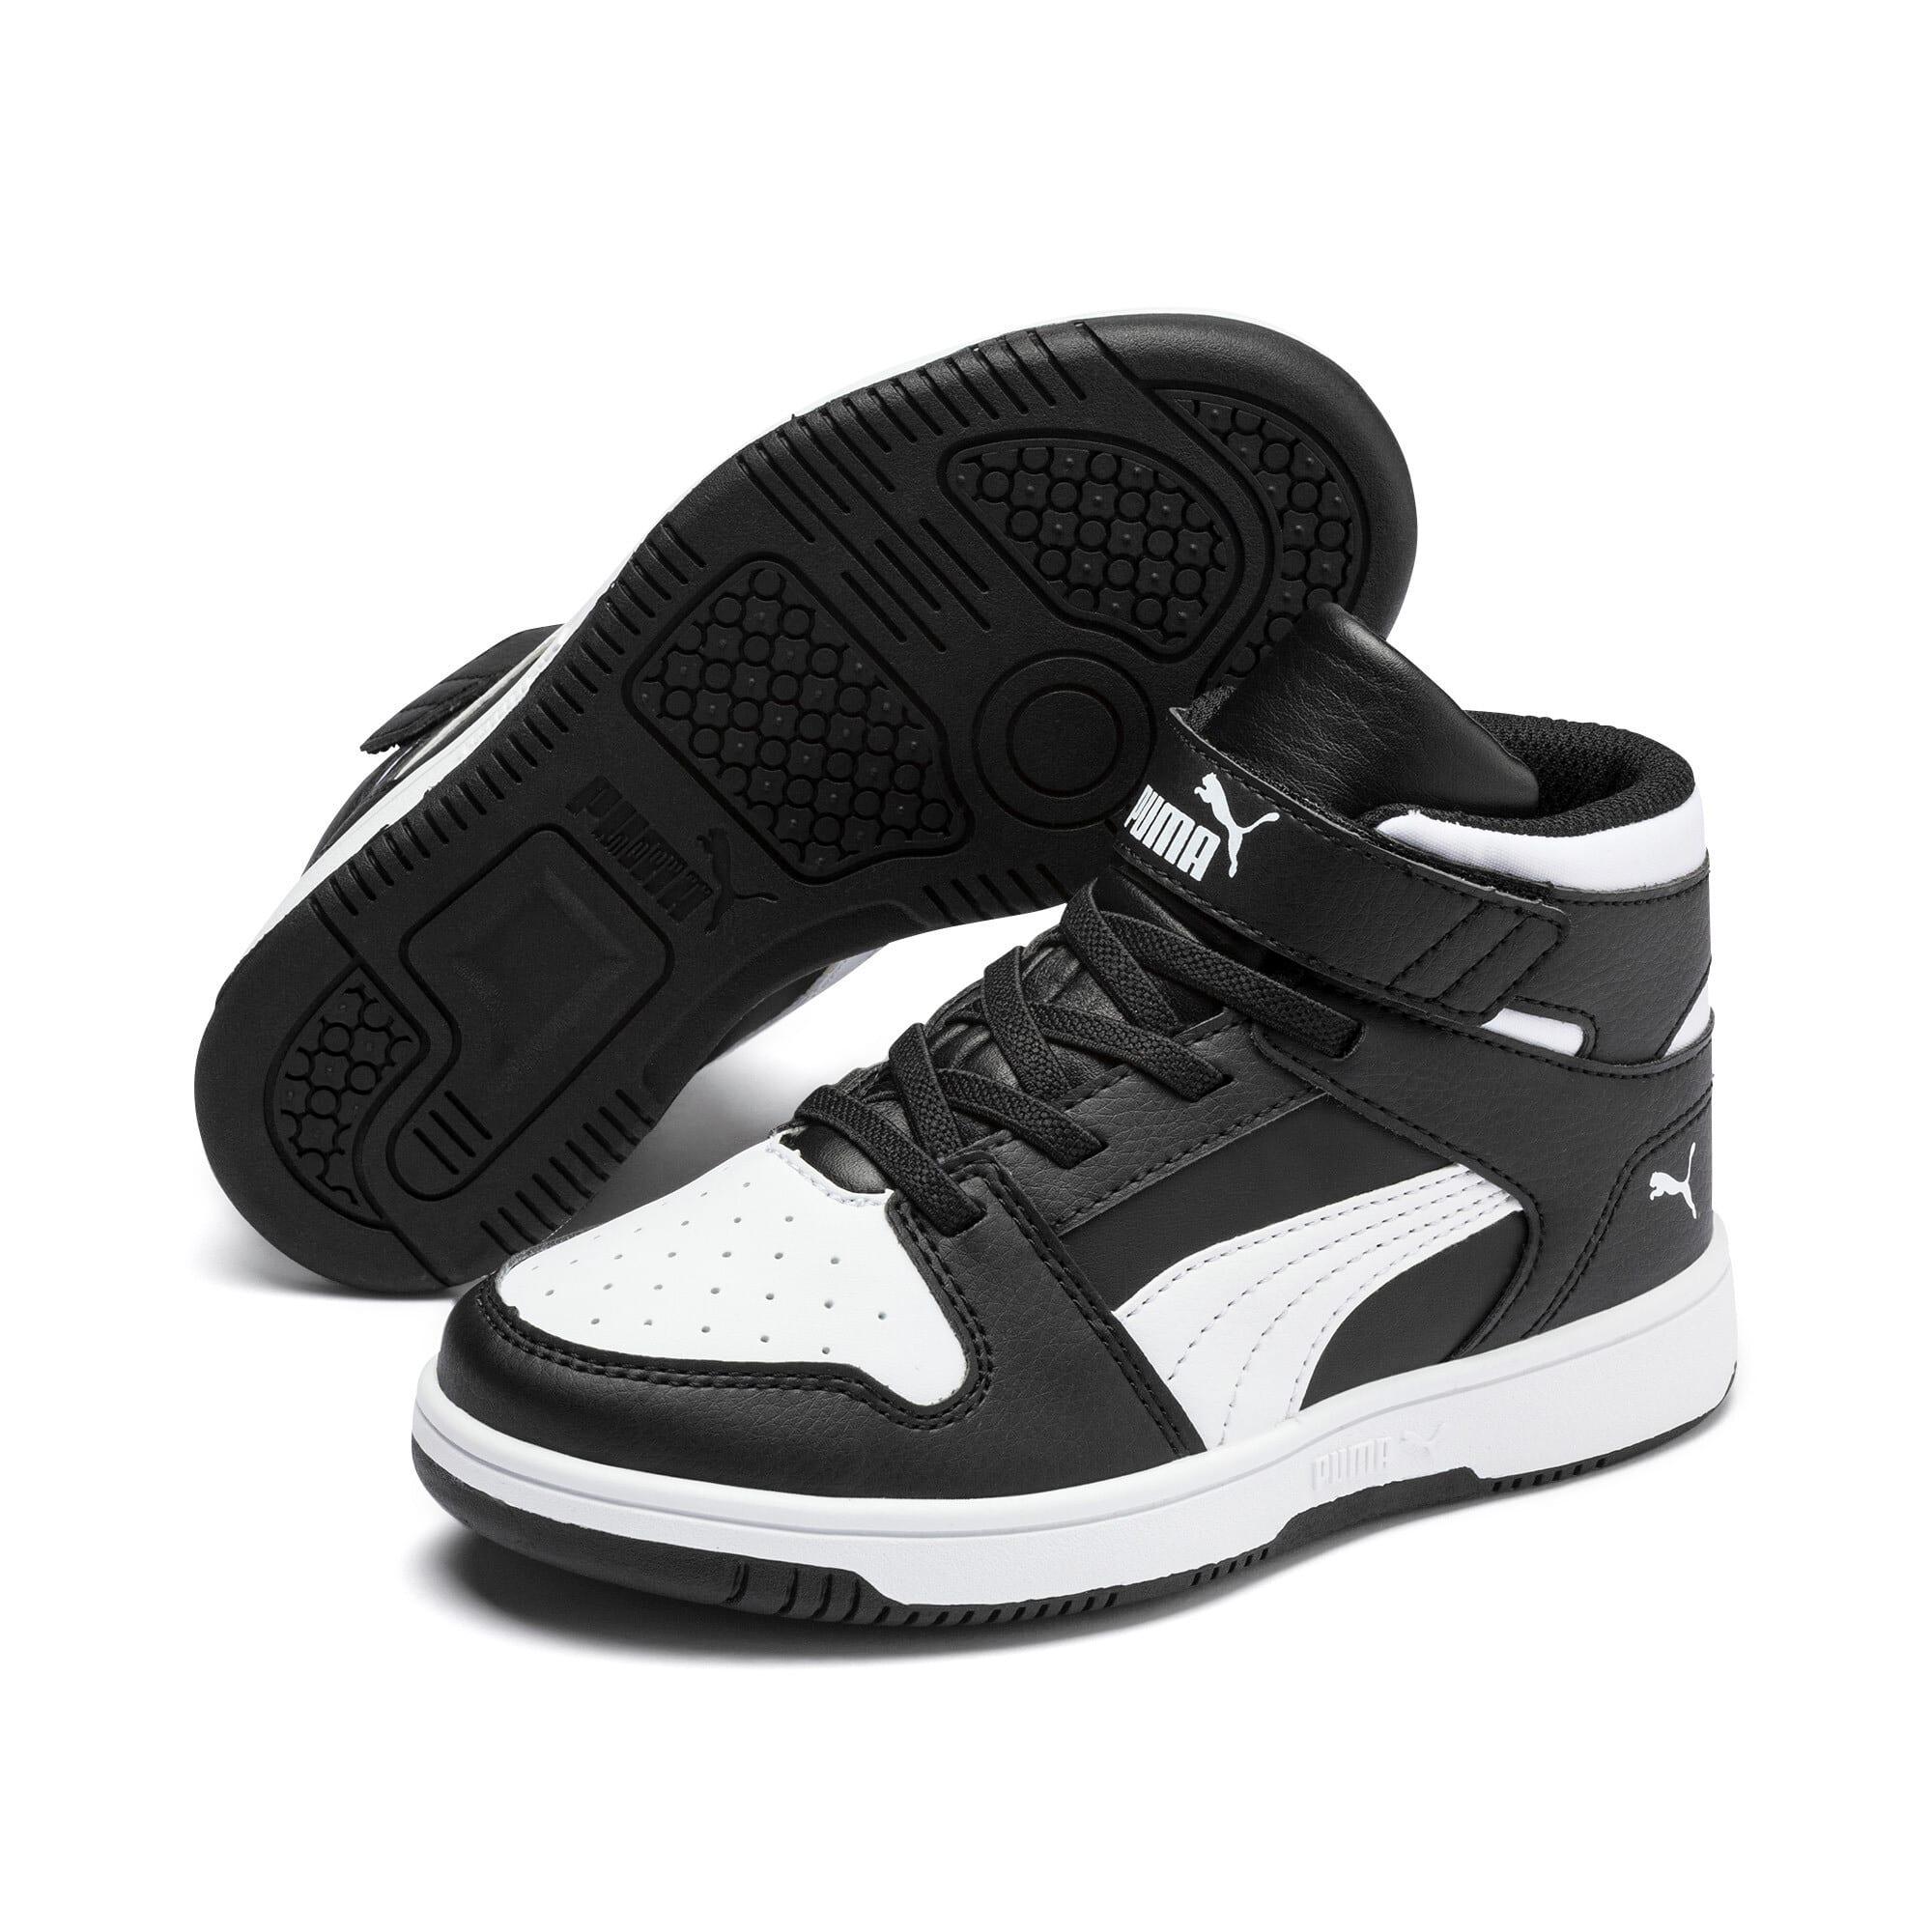 Thumbnail 2 of PUMA Rebound LayUp Little Kids' Shoes, Puma Black-Puma White, medium